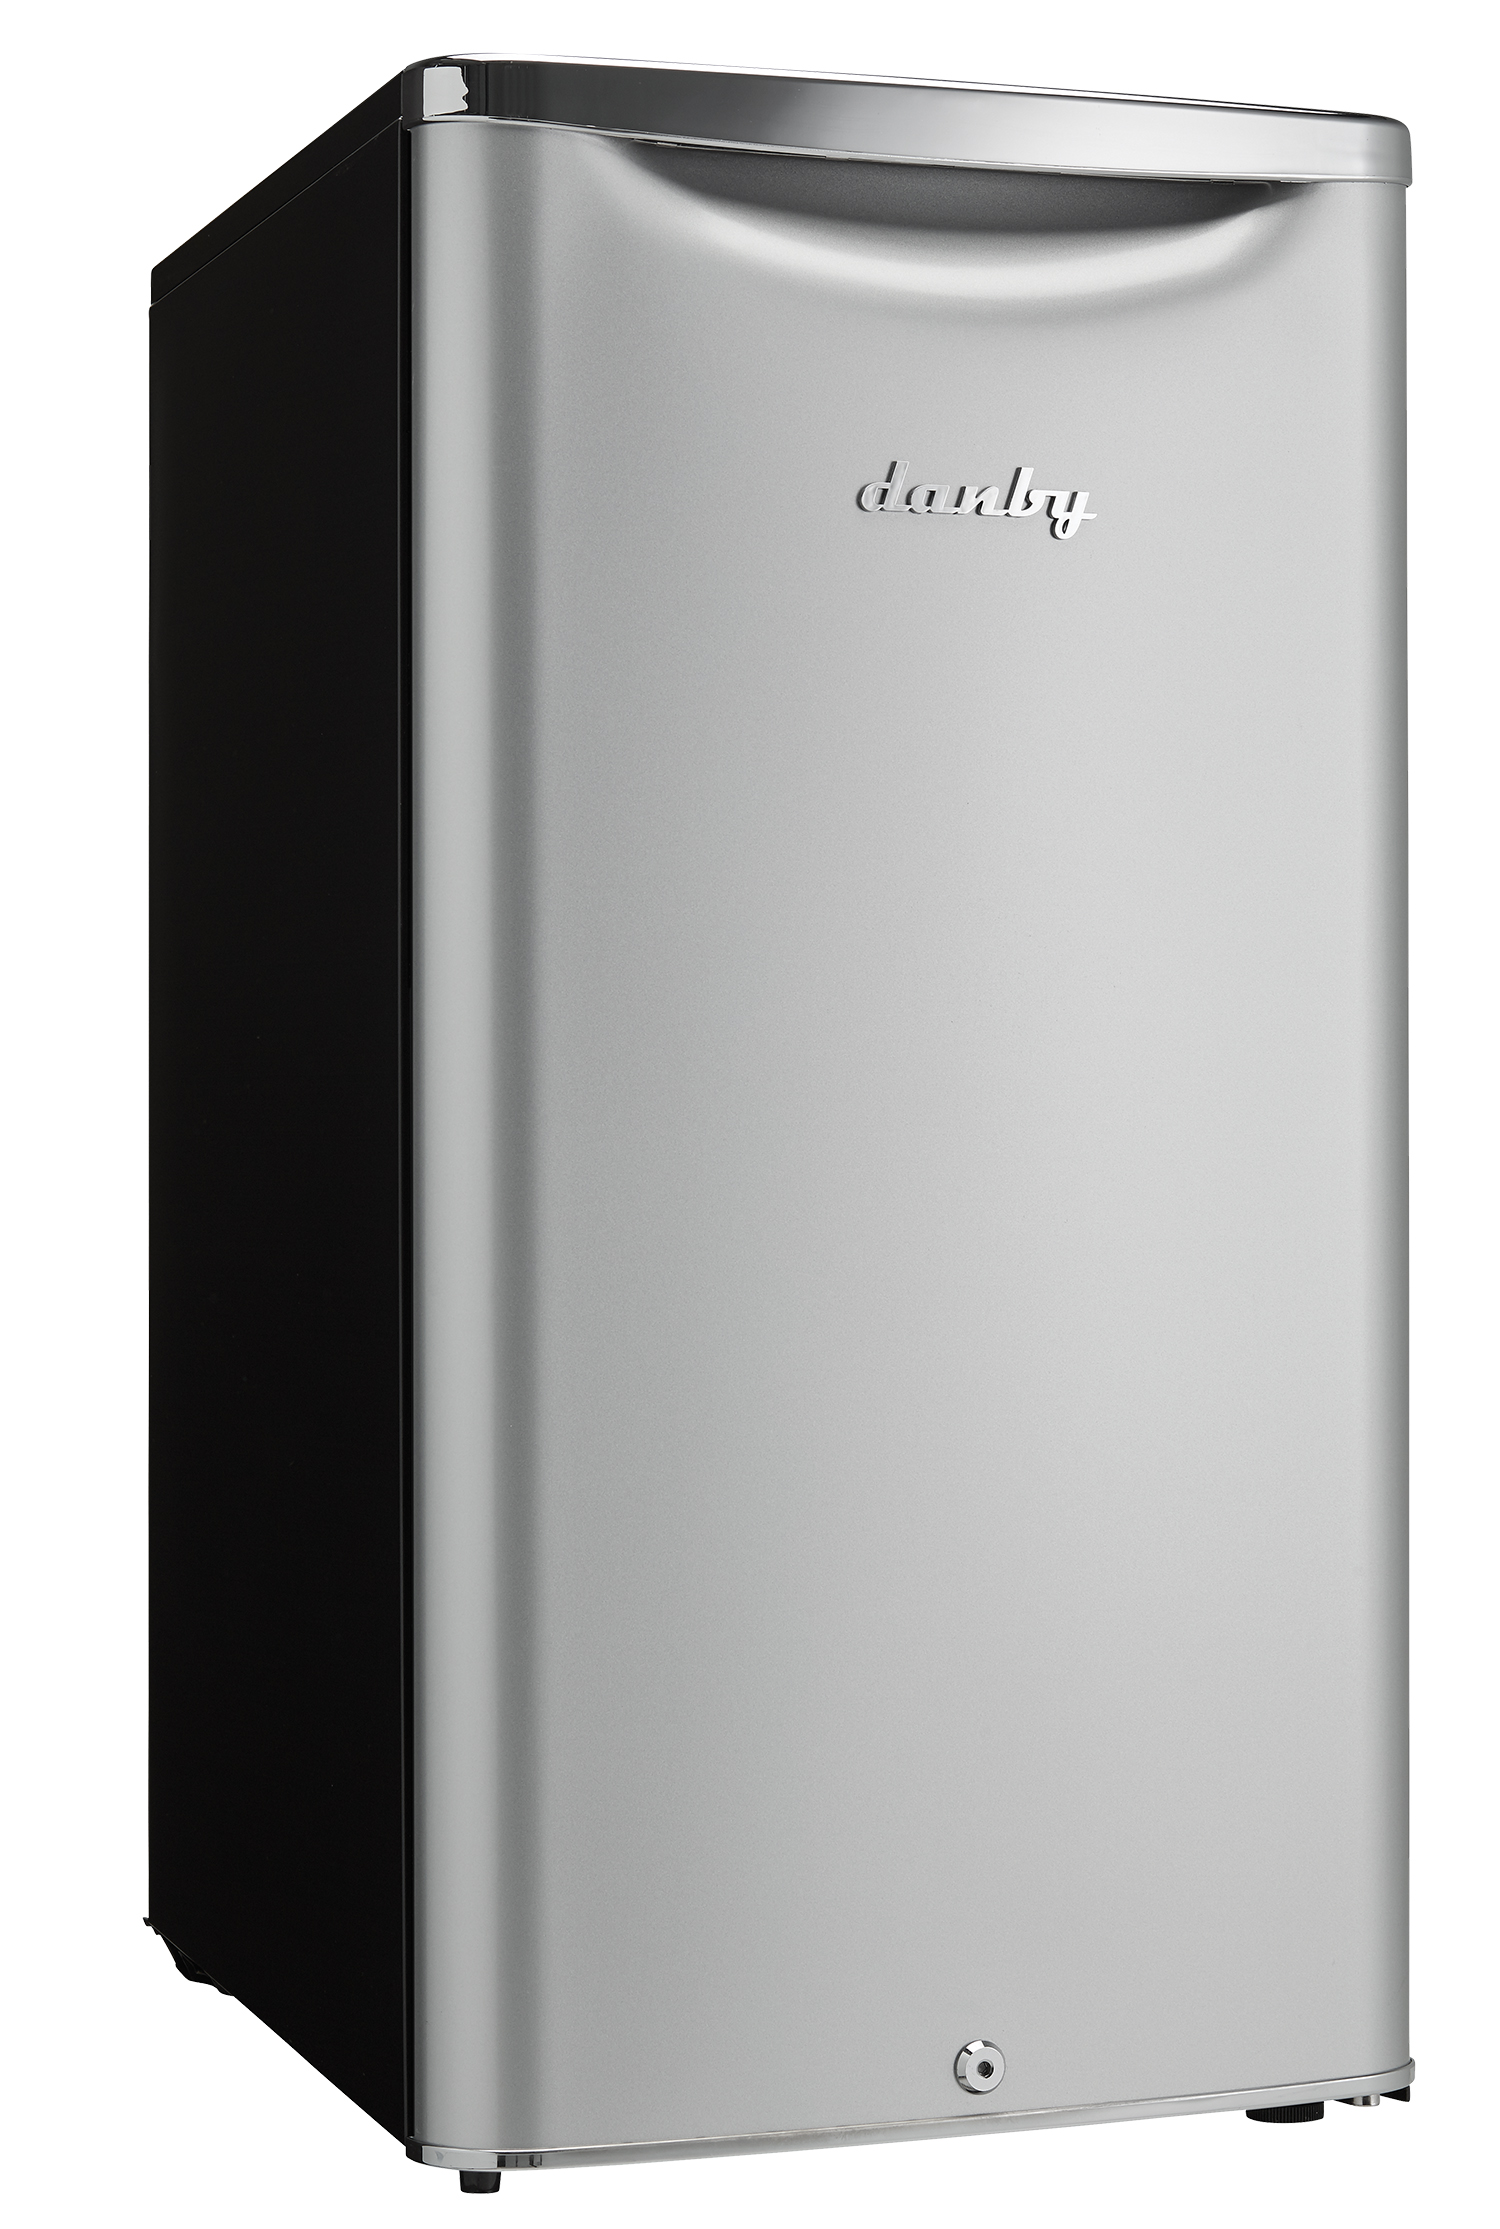 Danby Countertop Ice Maker Manual : DAR033A6DDB Danby 3.3 cu. ft. Compact Refrigerator EN-US